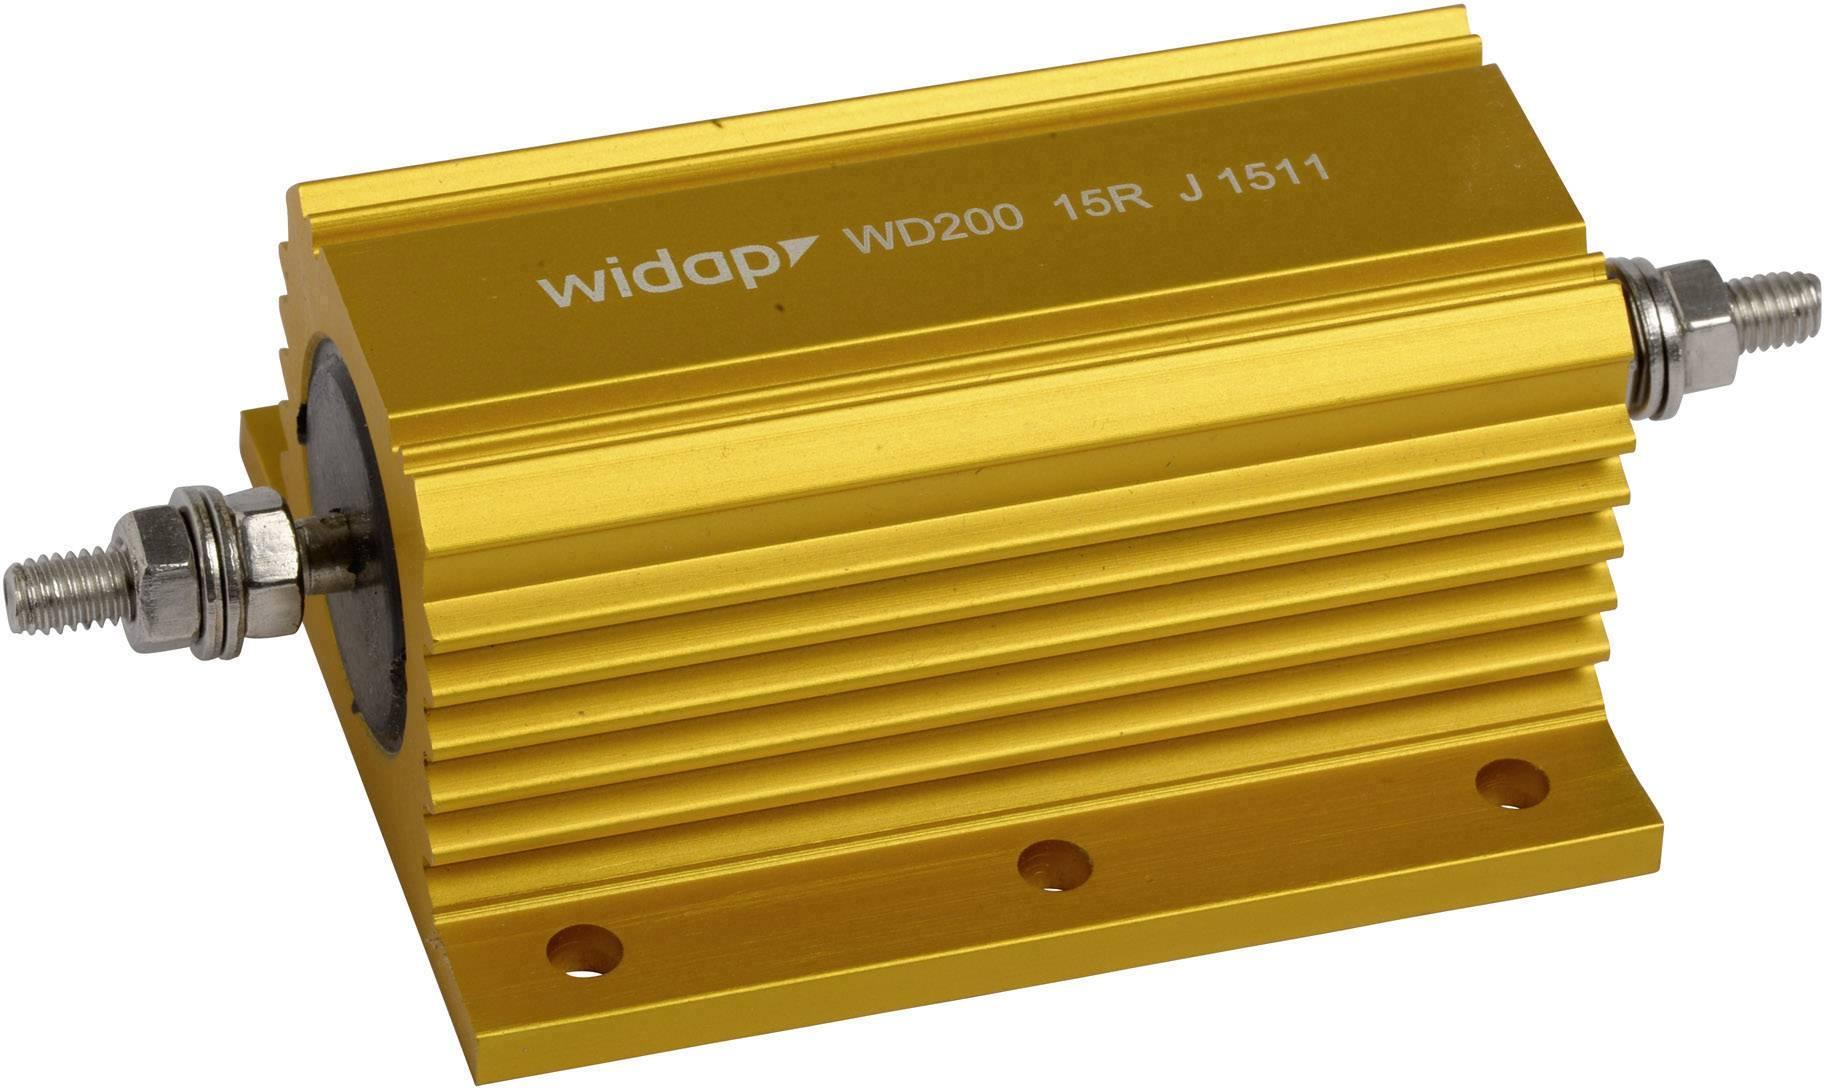 Drôtový rezistor Widap 160144, hodnota odporu 1.0 Ohm, 200 W, 1 ks